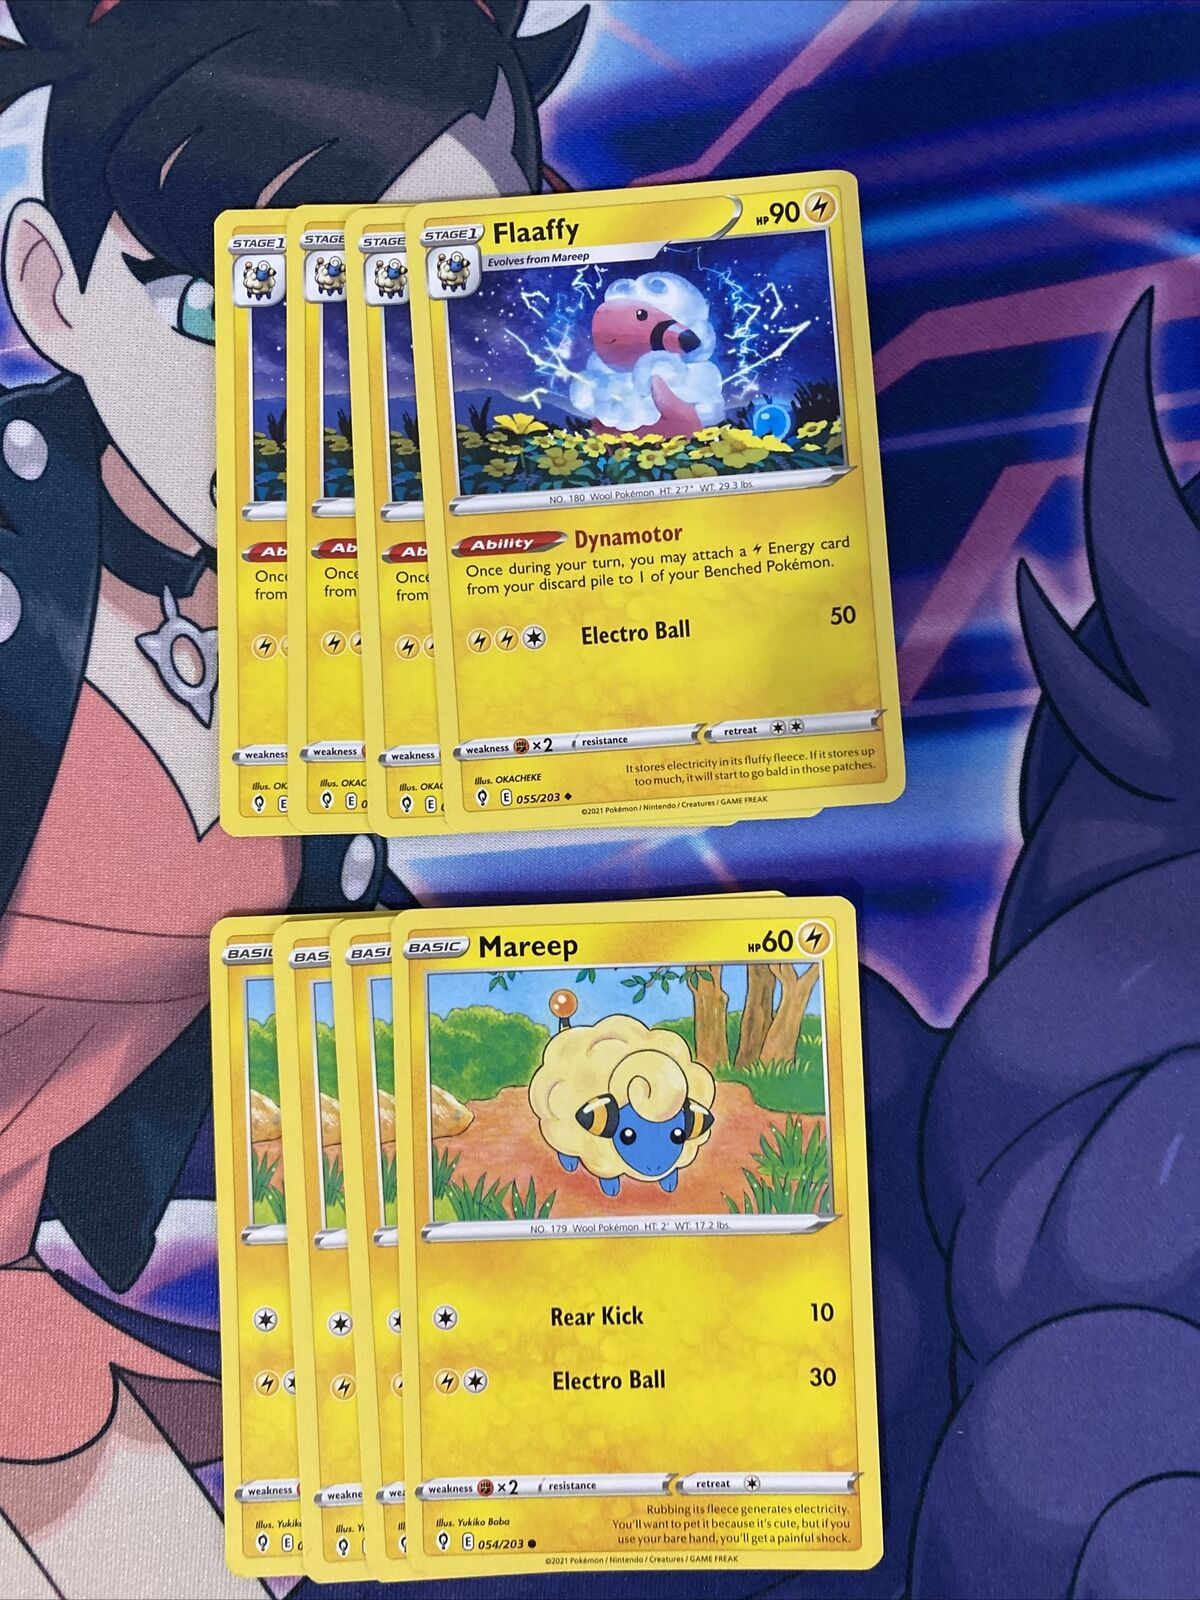 4x Flaaffy 055/203 And Mareep Evolving Skies Pokemon Card Play Set NM/M